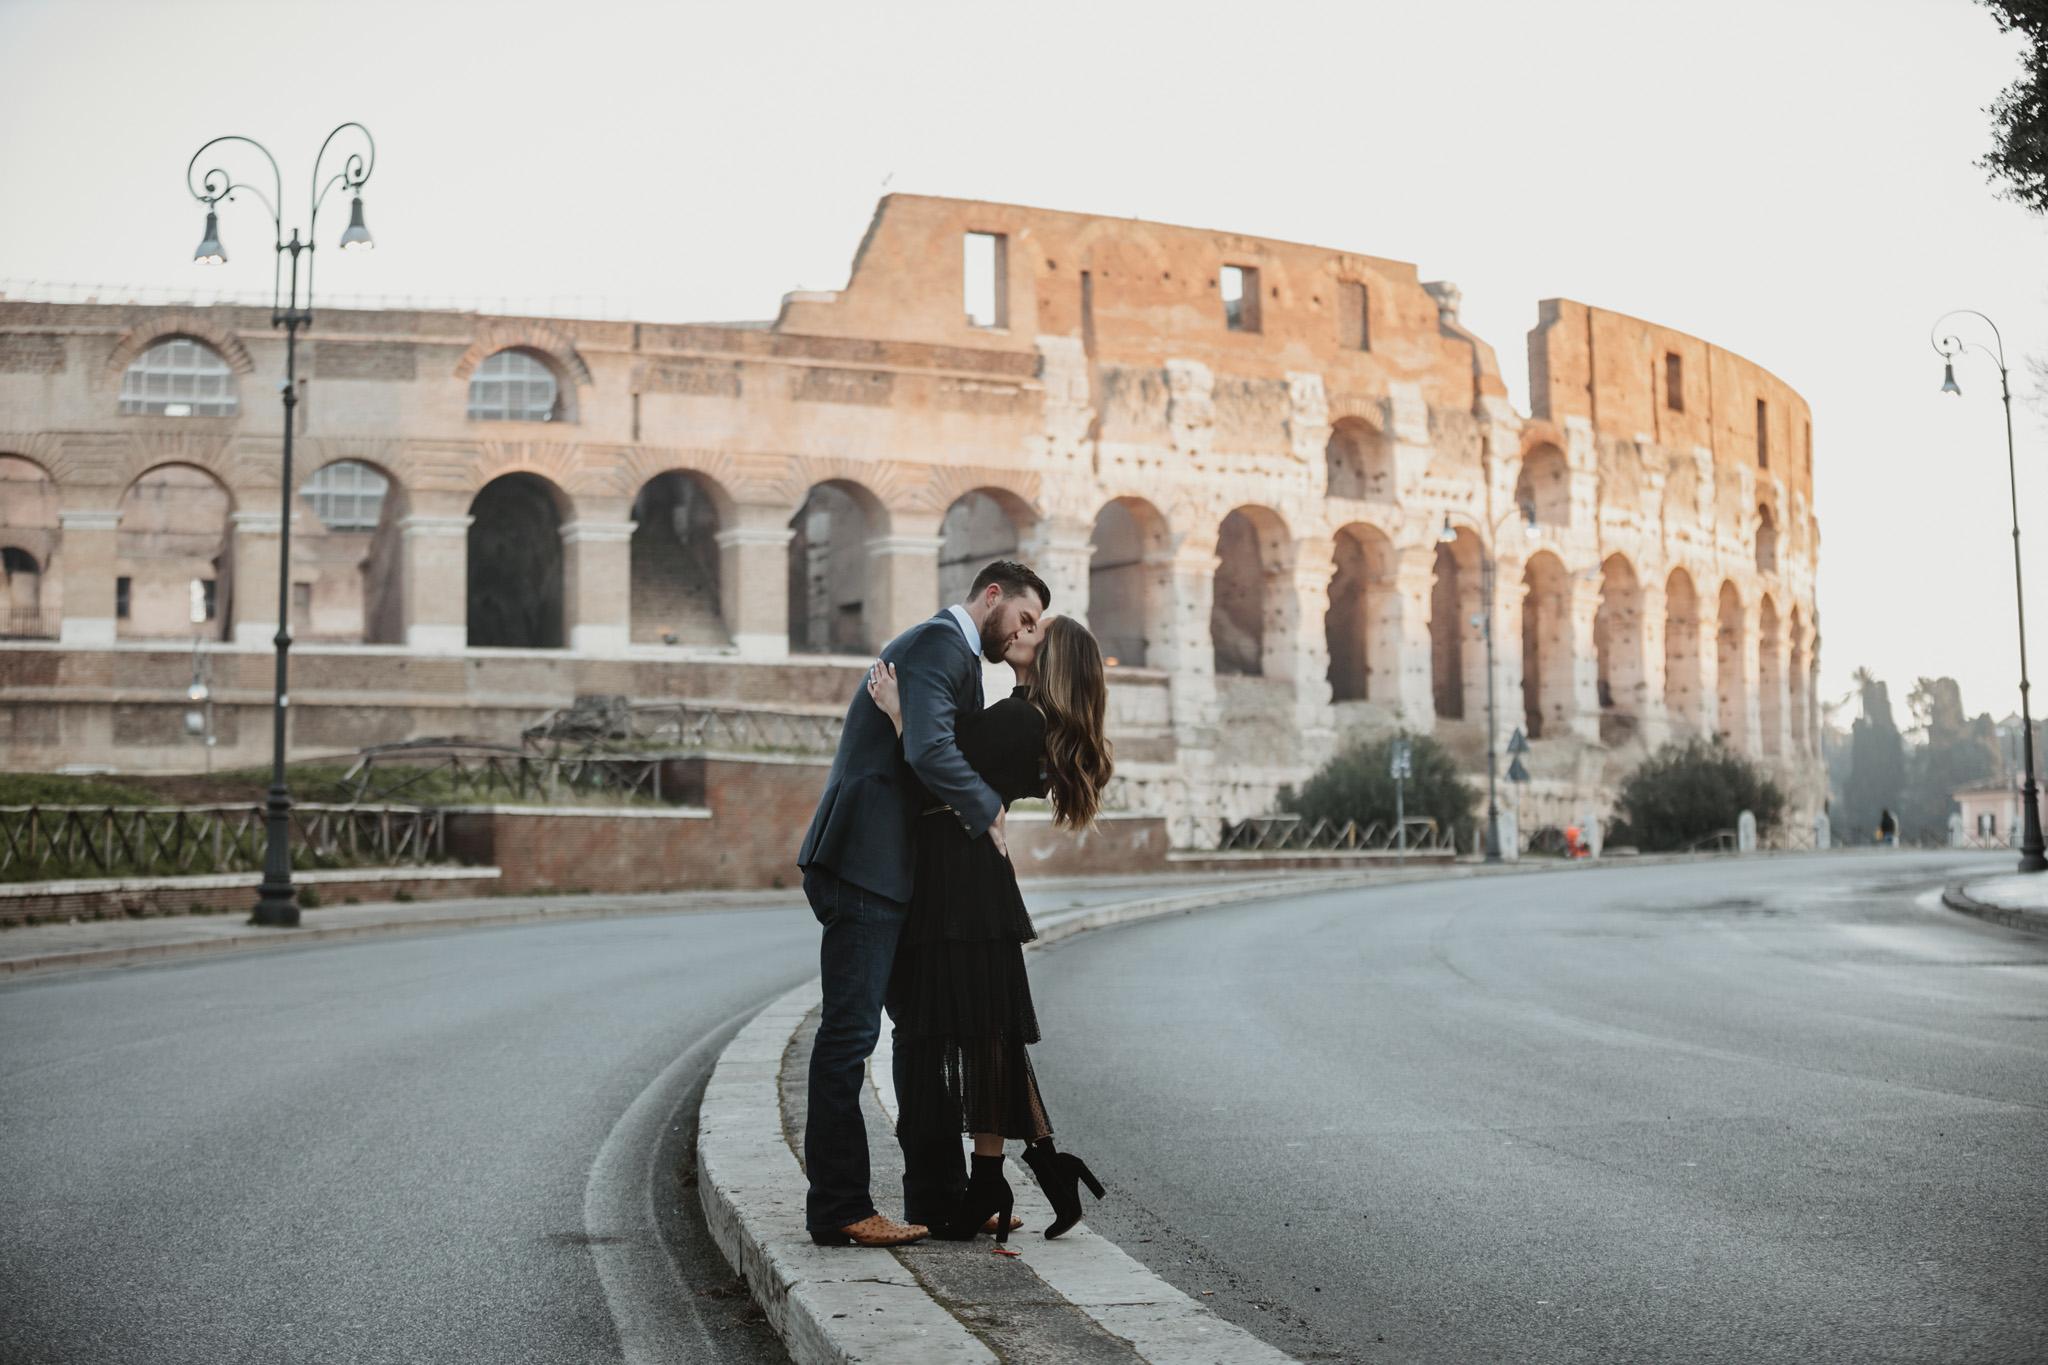 www.fabioschiazza.com - Engagement photographer Rome